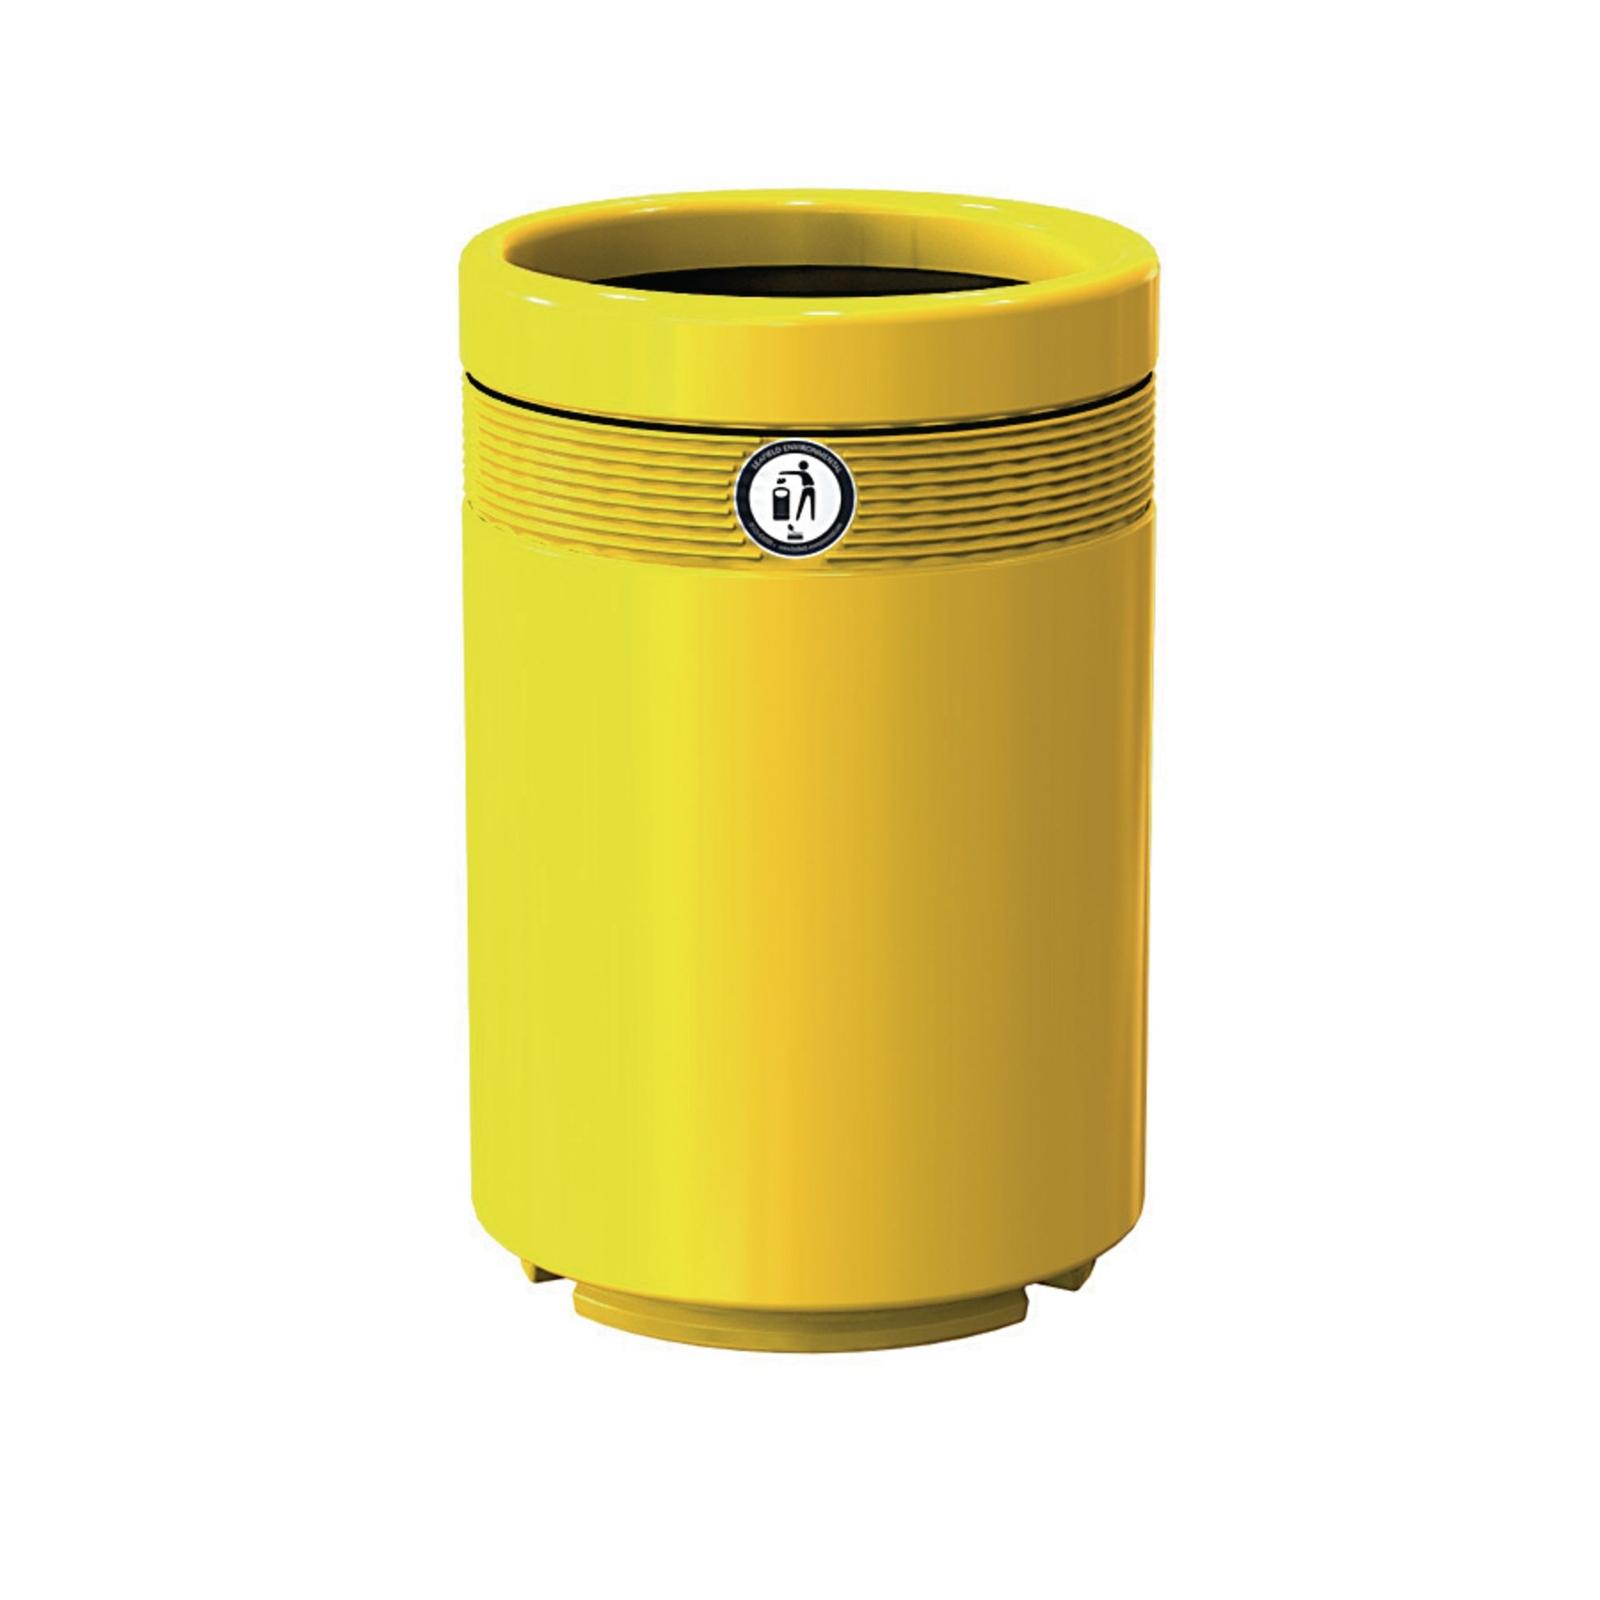 Monarch Litter Bin - Economy - Yellow